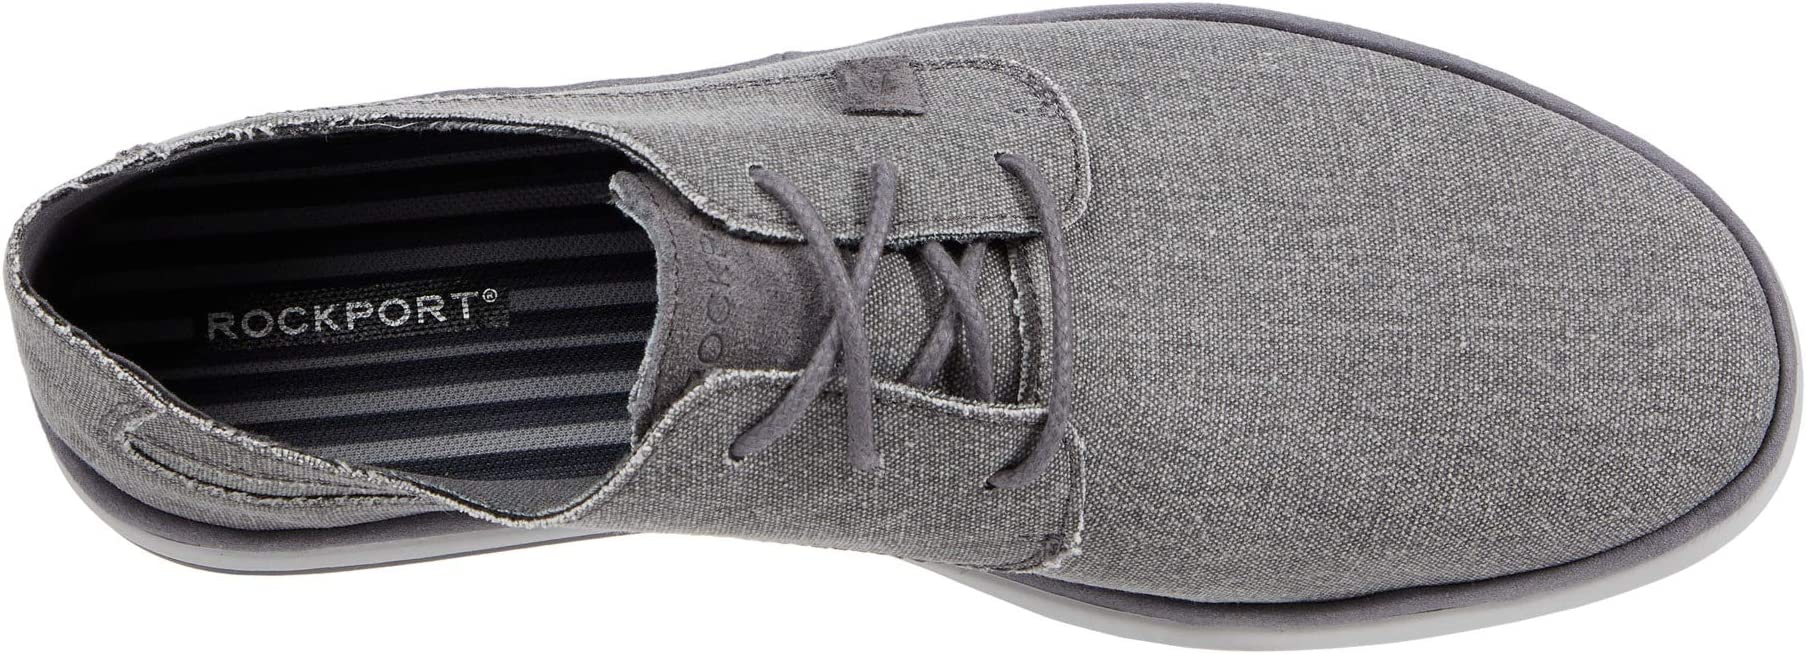 Rockport Austyn Plain Toe | Men's shoes | 2020 Newest